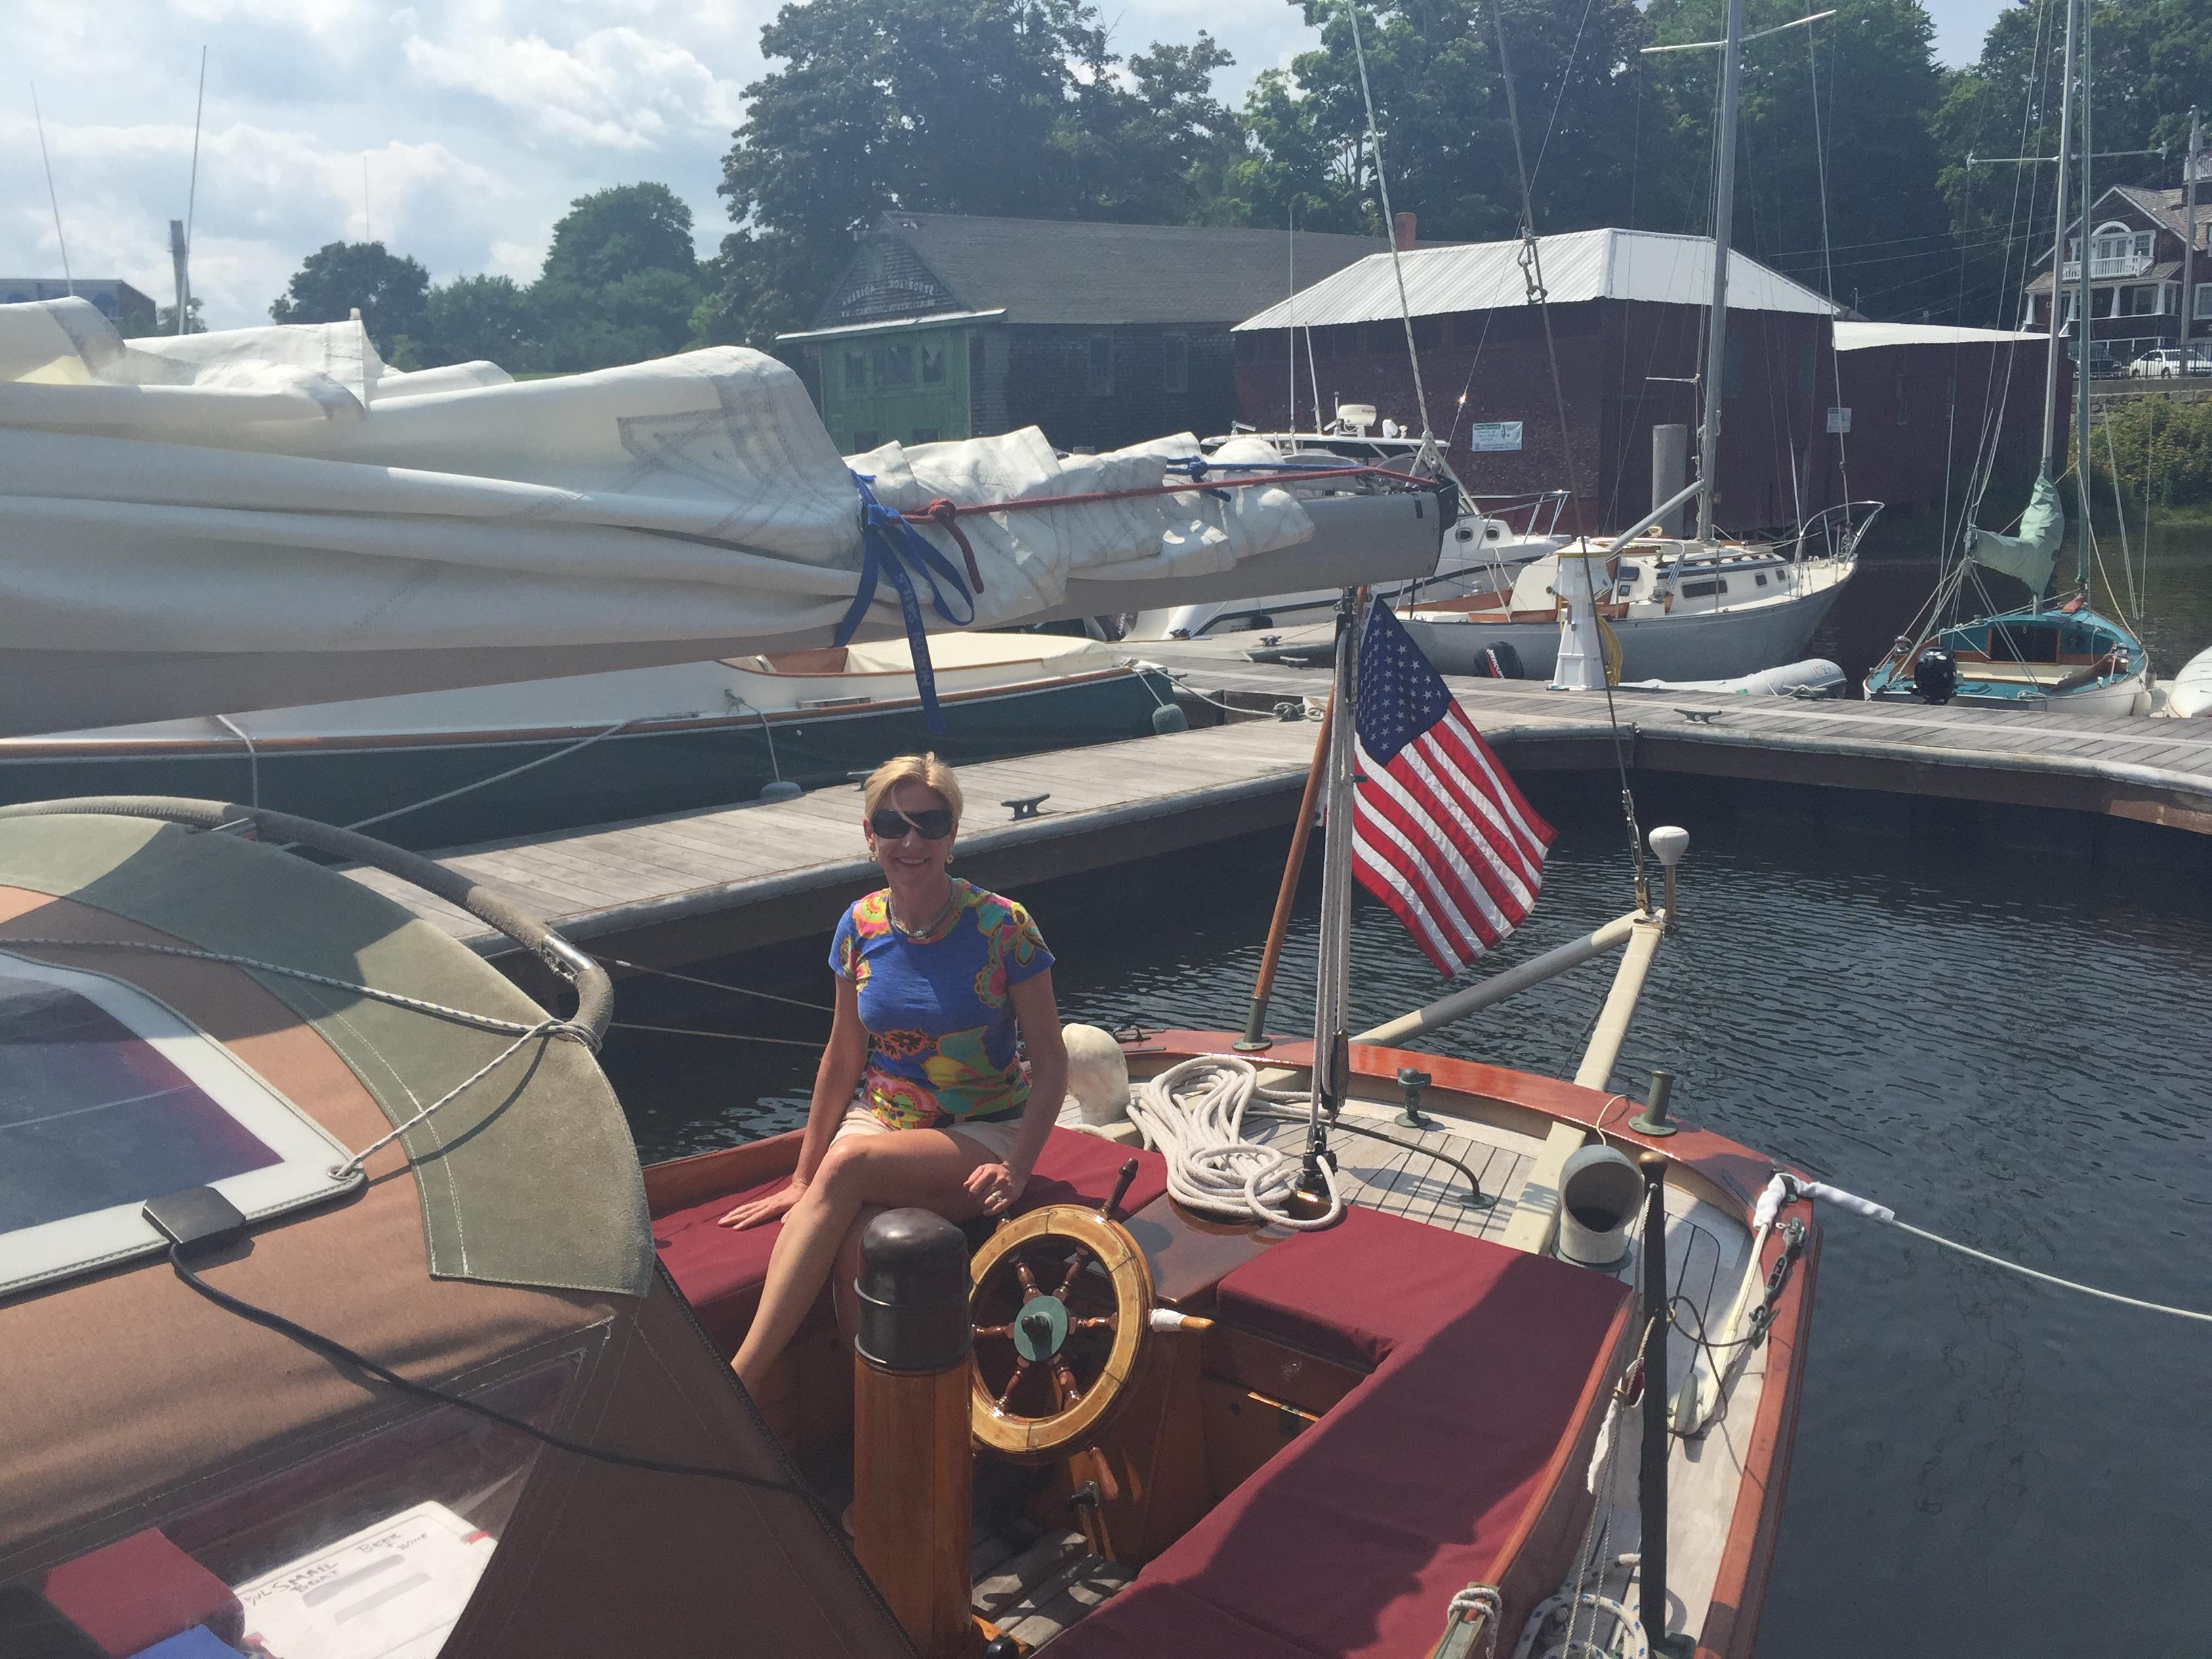 New England Rhode Island And Maine Laura Madrid Travel